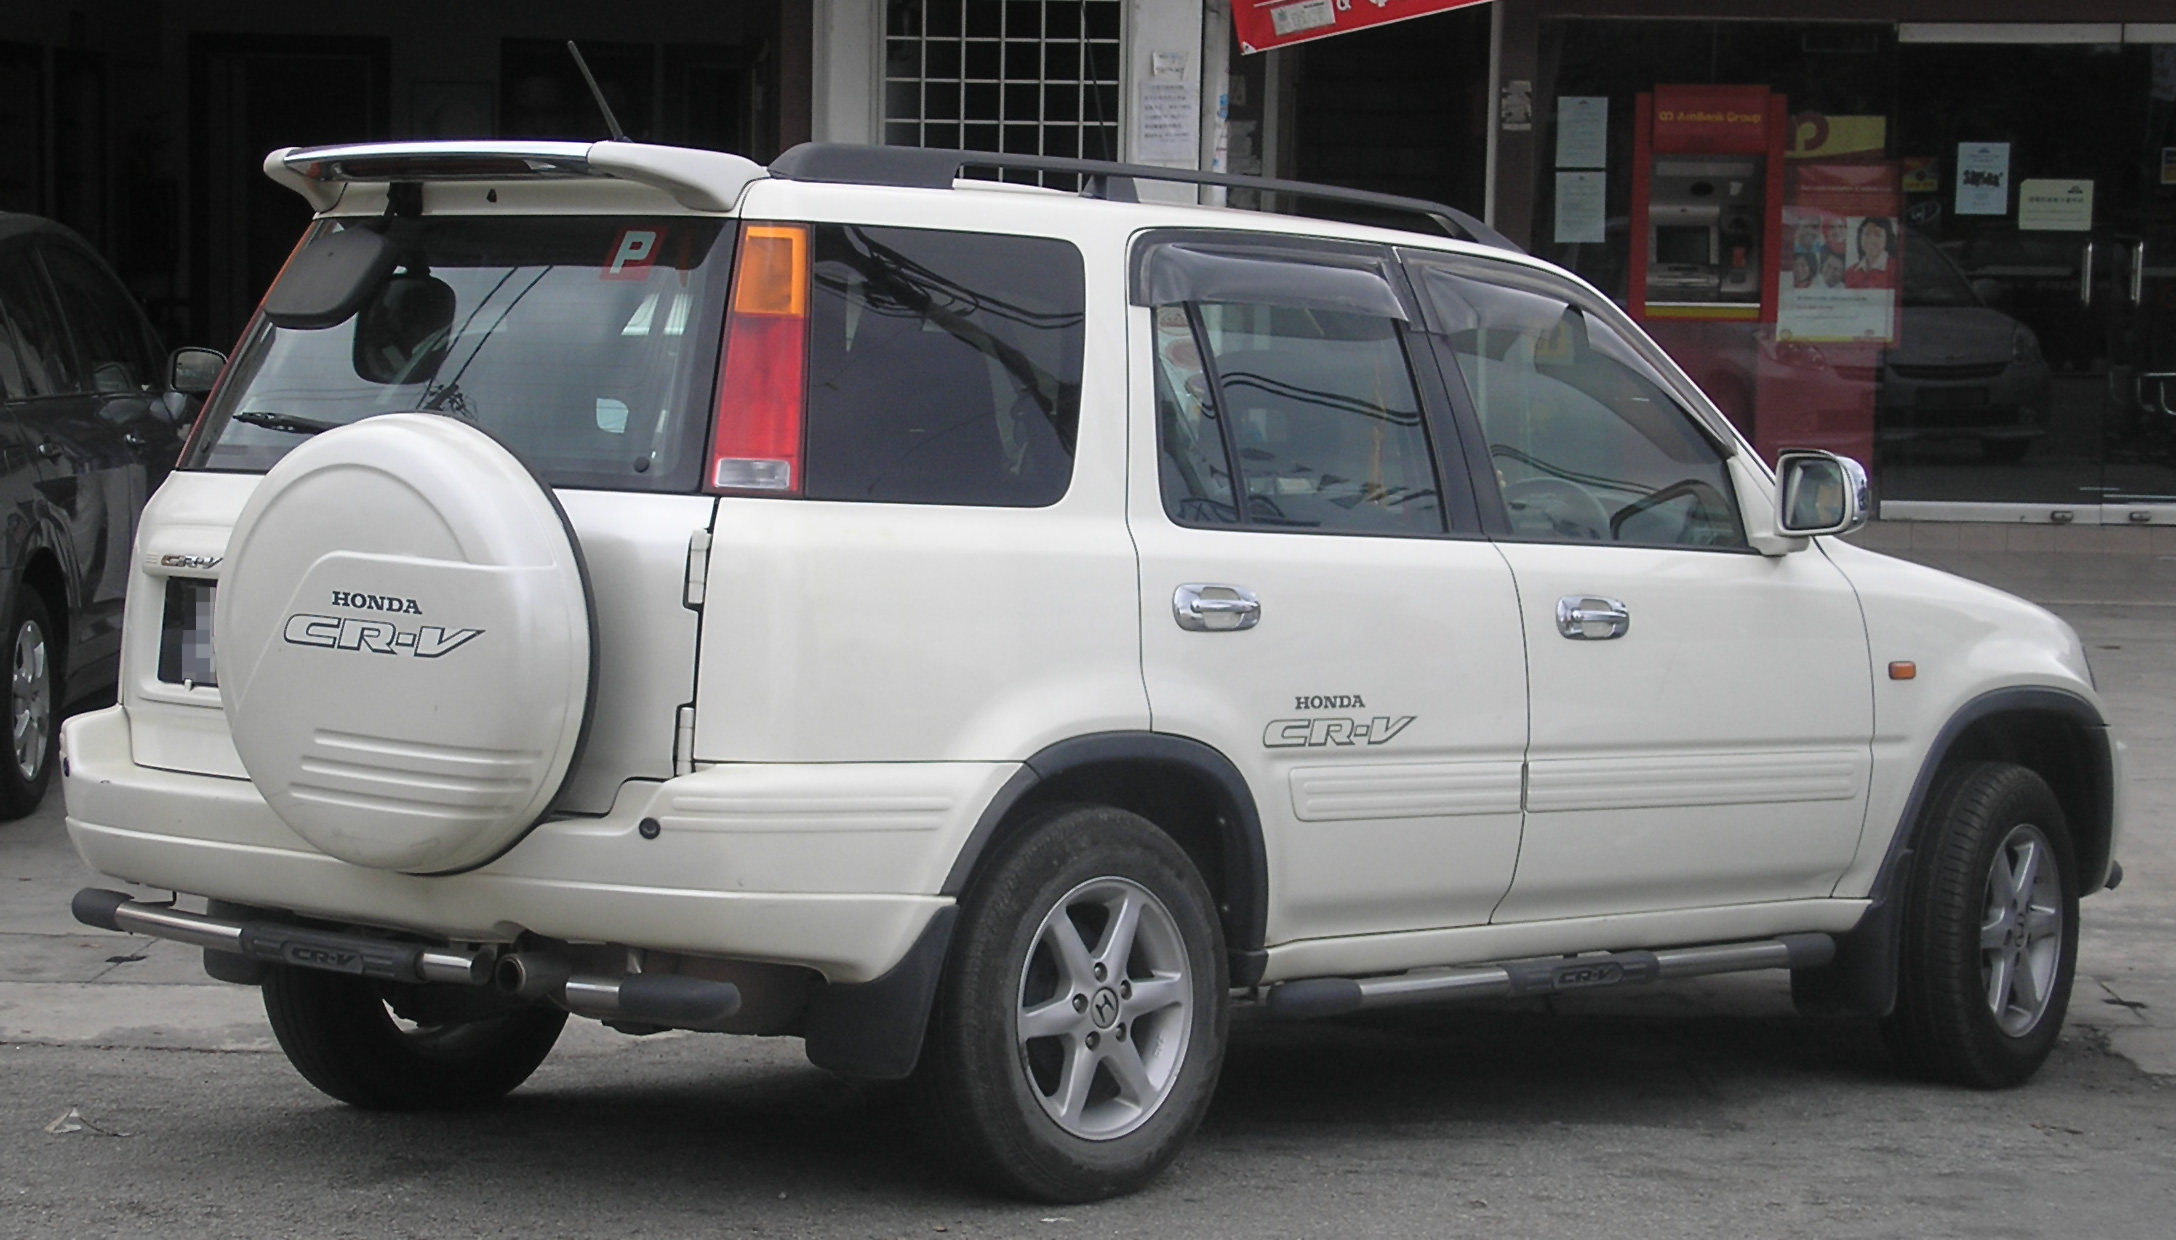 Honda Cr H >> File:Honda CR-V (first generation, first facelift) (rear), Semenyih.jpg - Wikimedia Commons